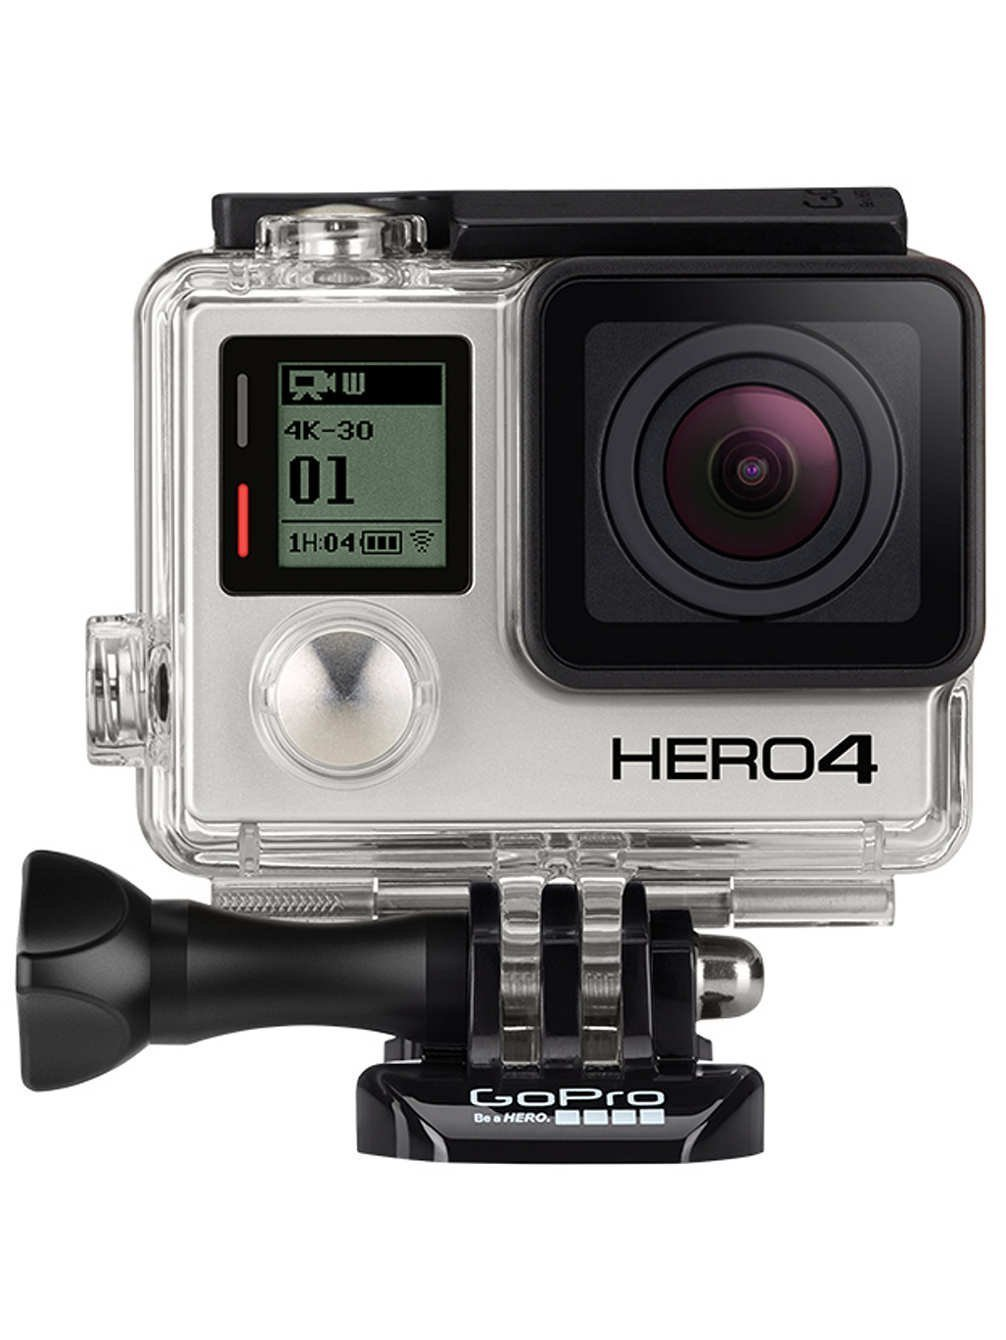 GoPro, Hero 4, Black, Silver, Session, Actioncam, Kamera, Ausrüstung, Weltreise